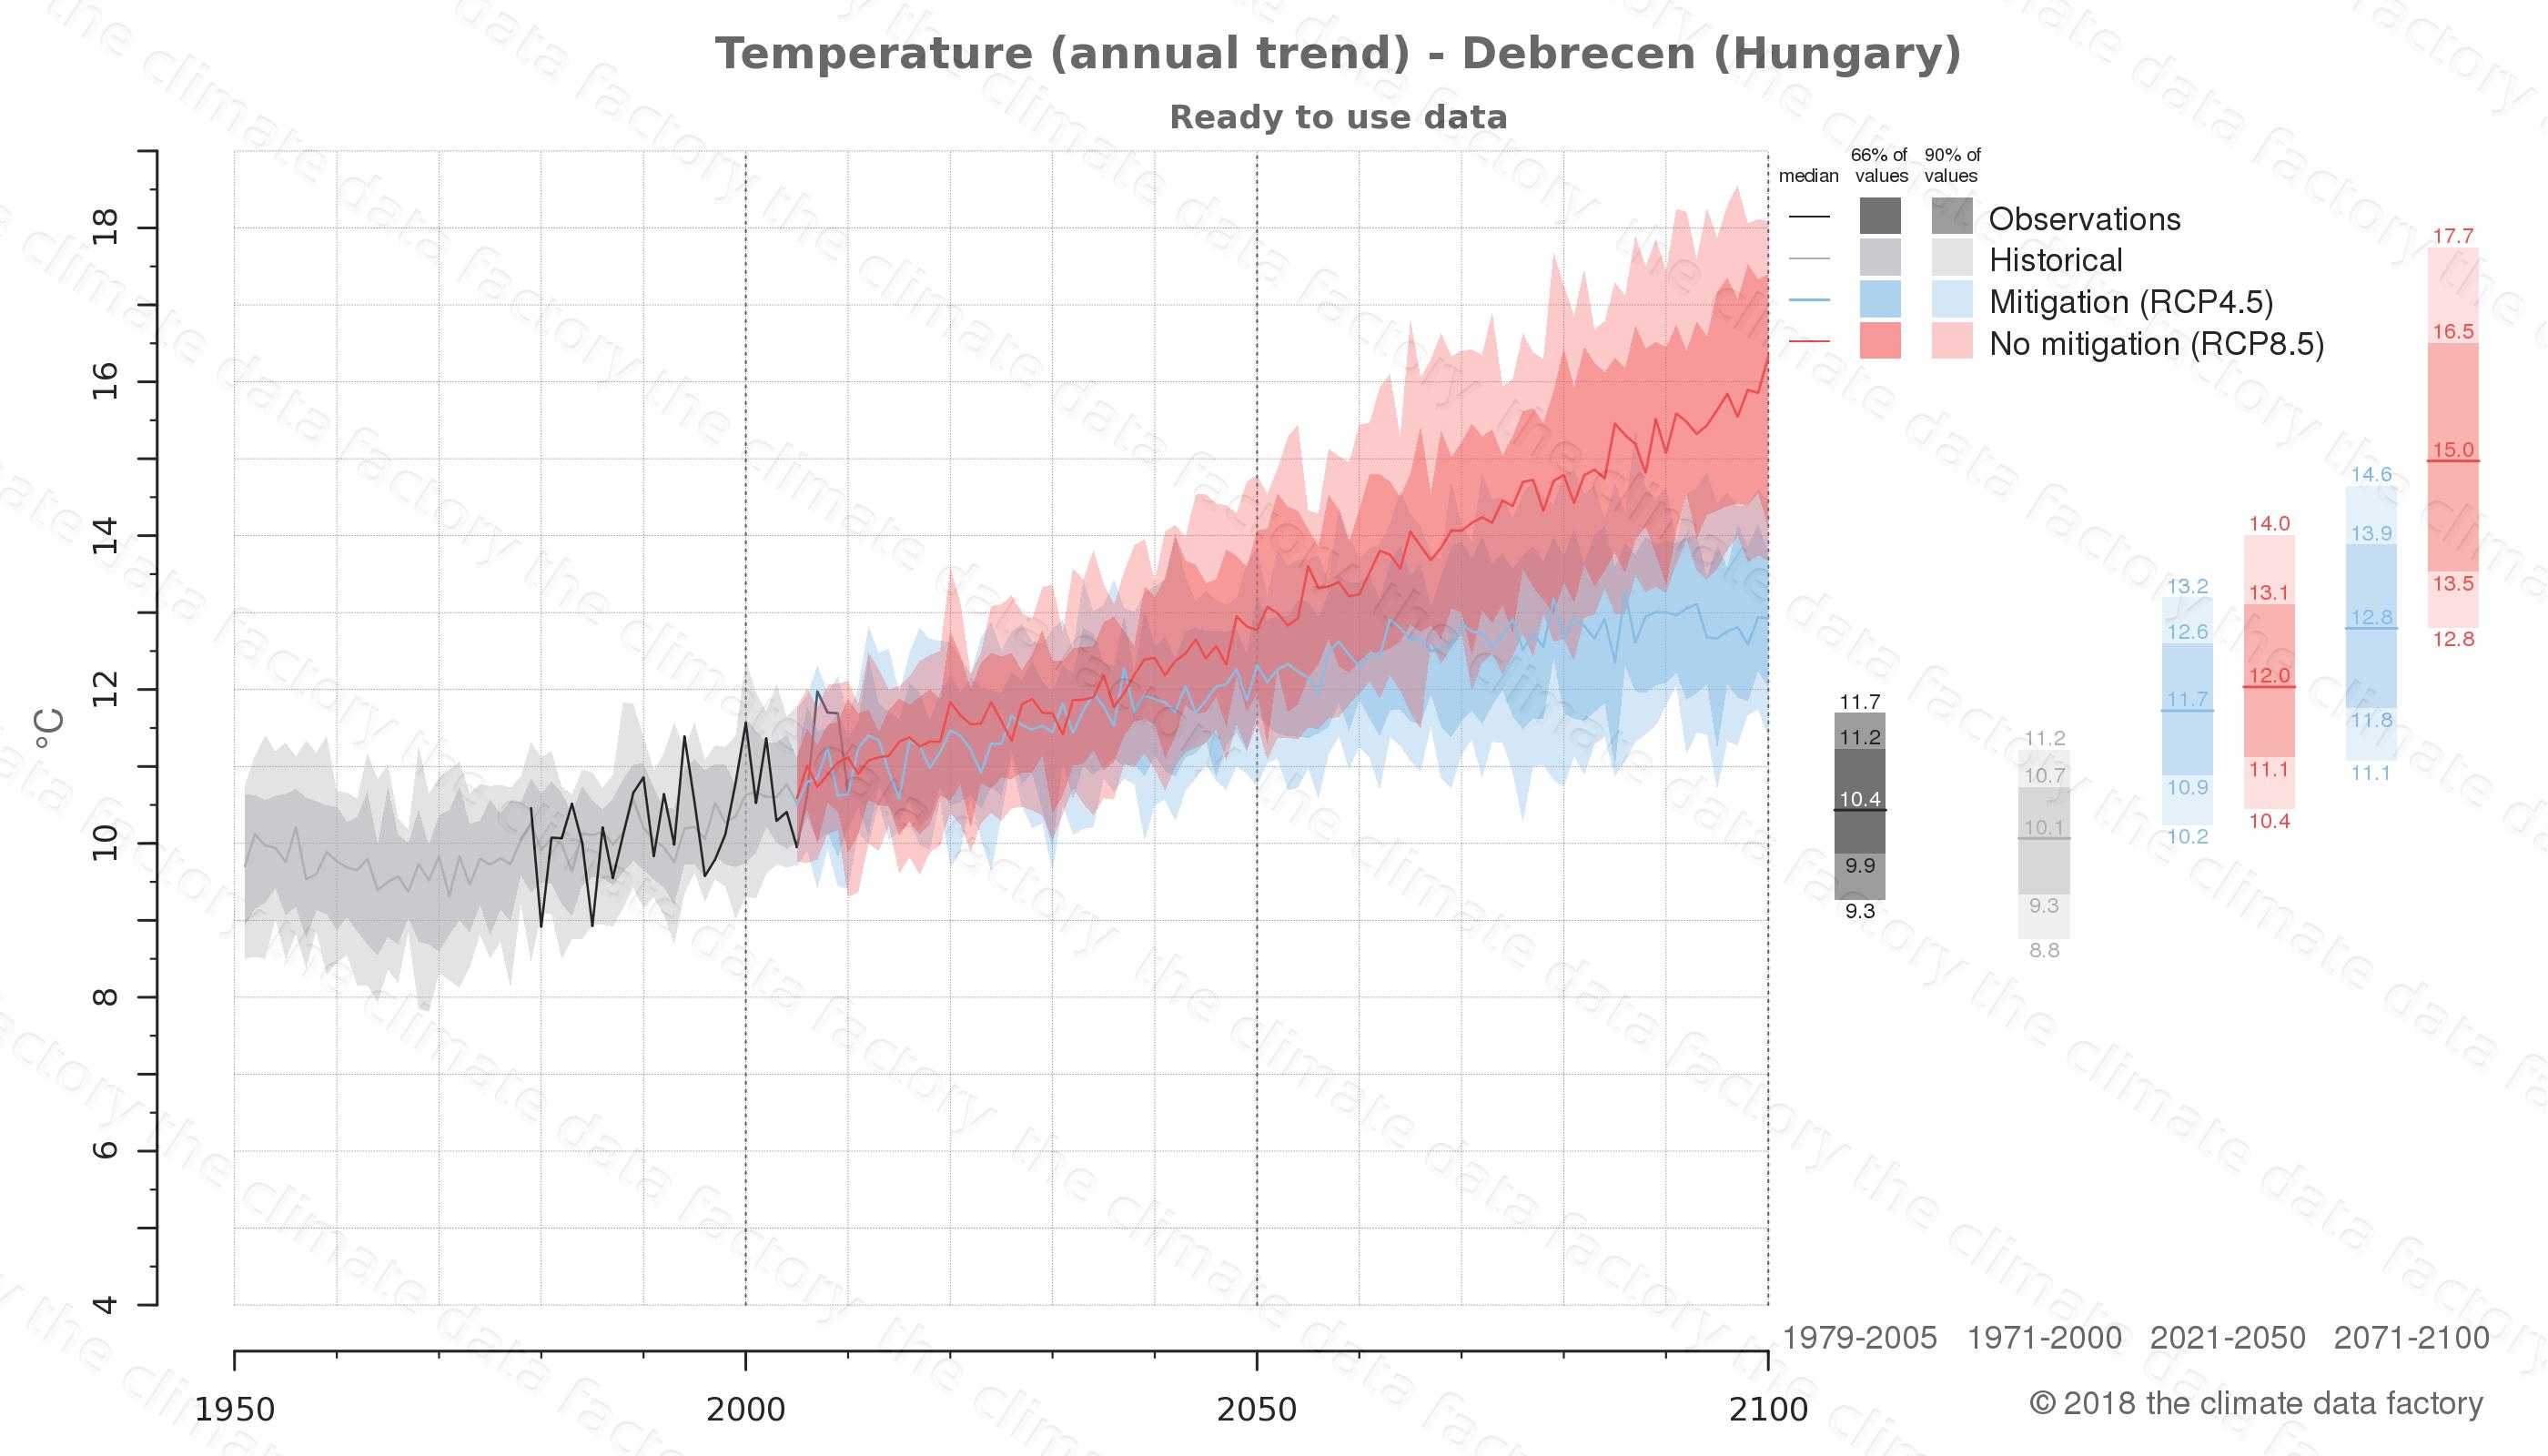 climate change data policy adaptation climate graph city data temperature debrecen hungary